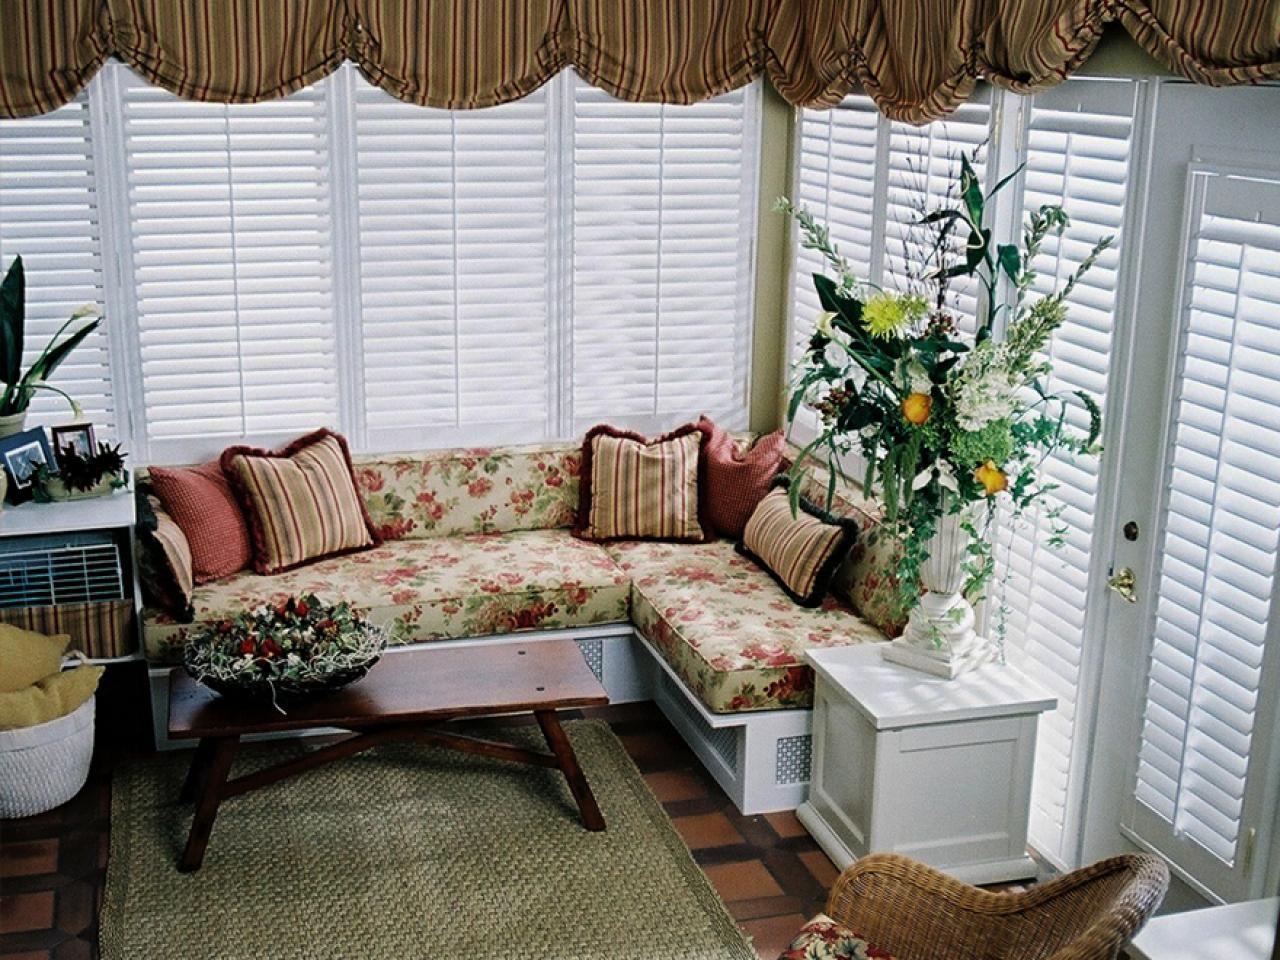 Candice Olson's Best Window Seats | Candice Tells All | HGTV